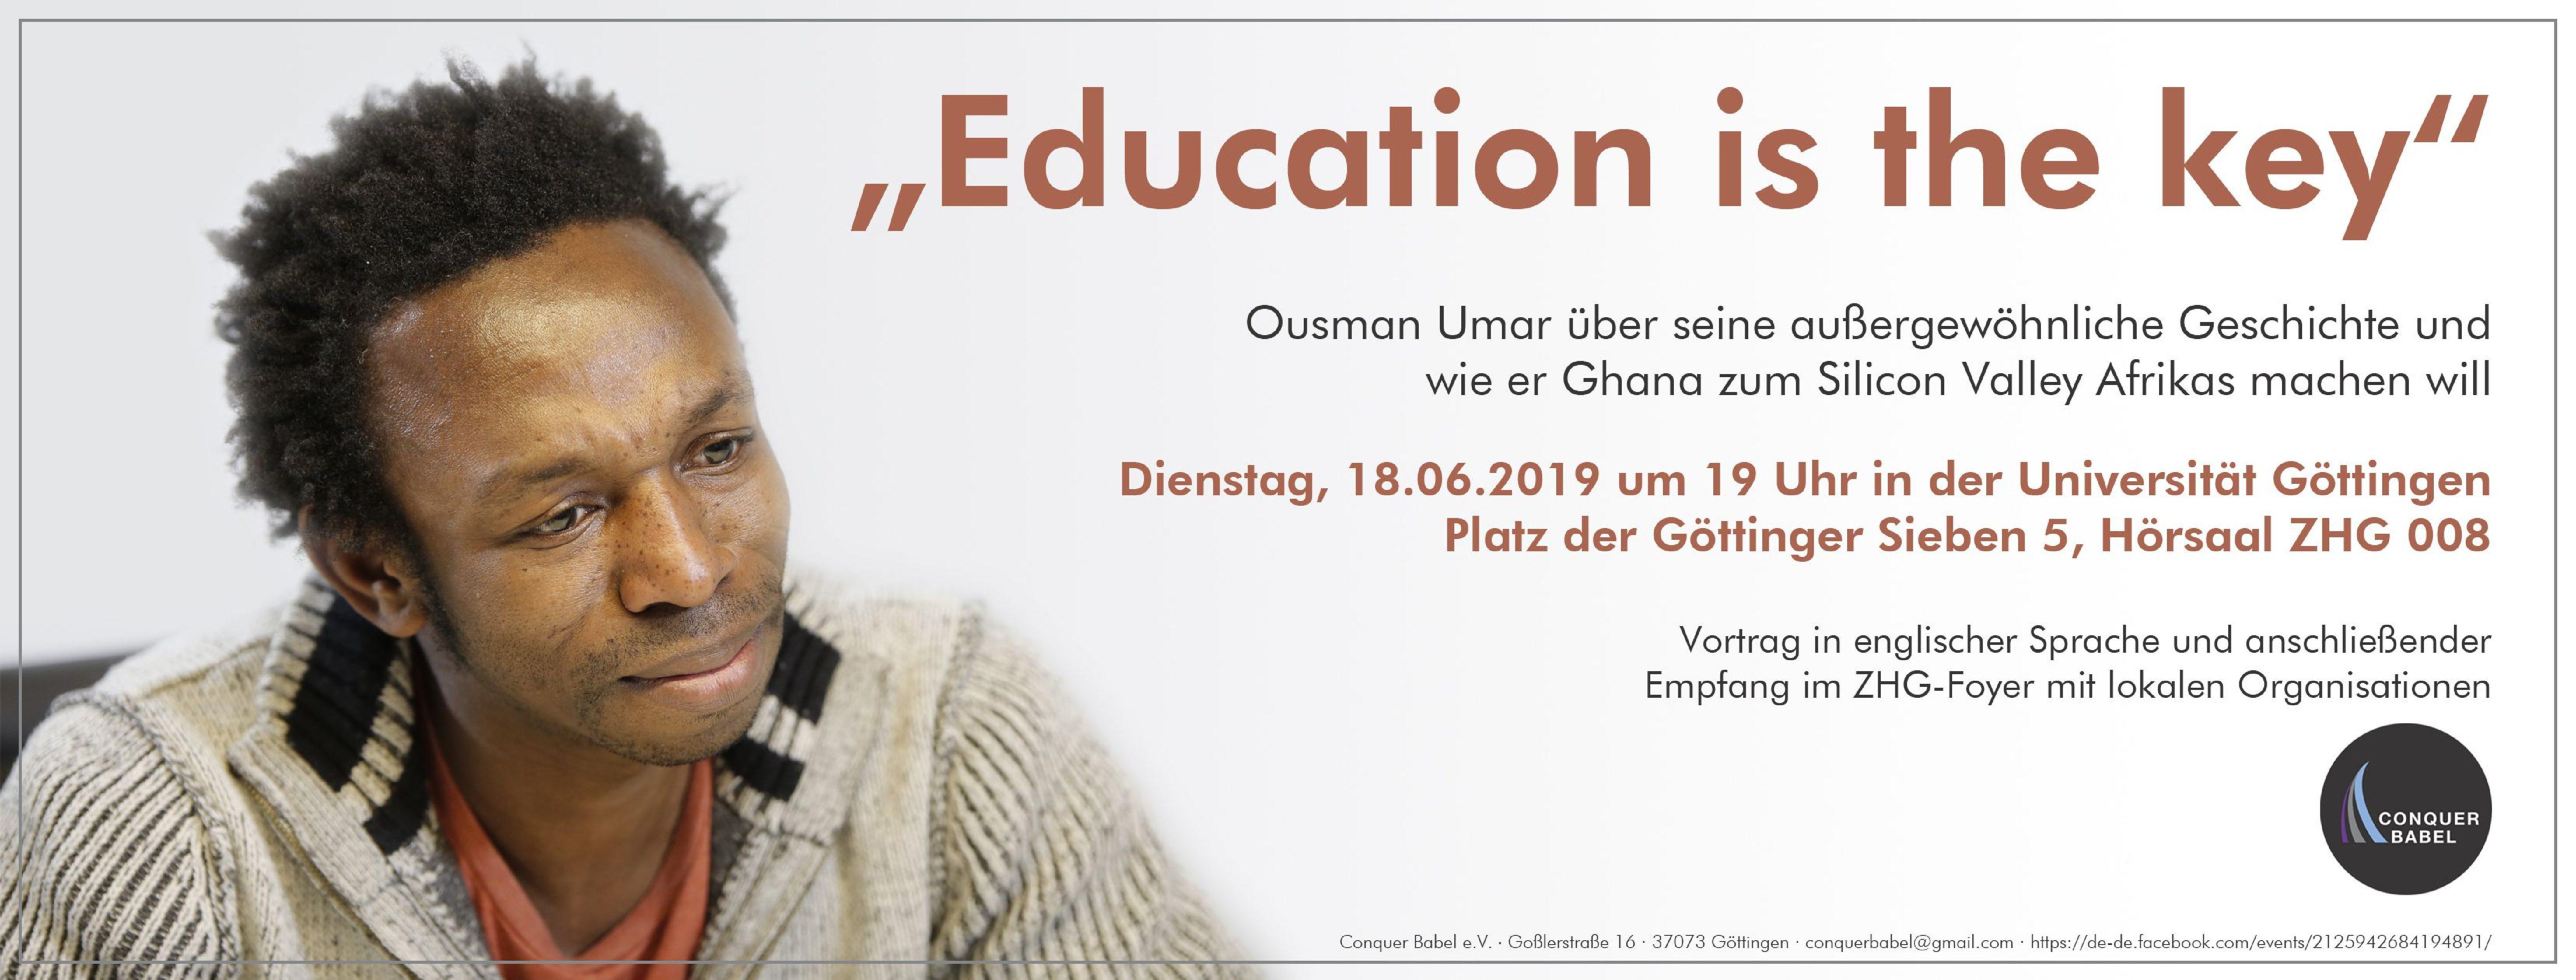 "Vortrag mit anschließendem Empfang: ""Education is the key"""